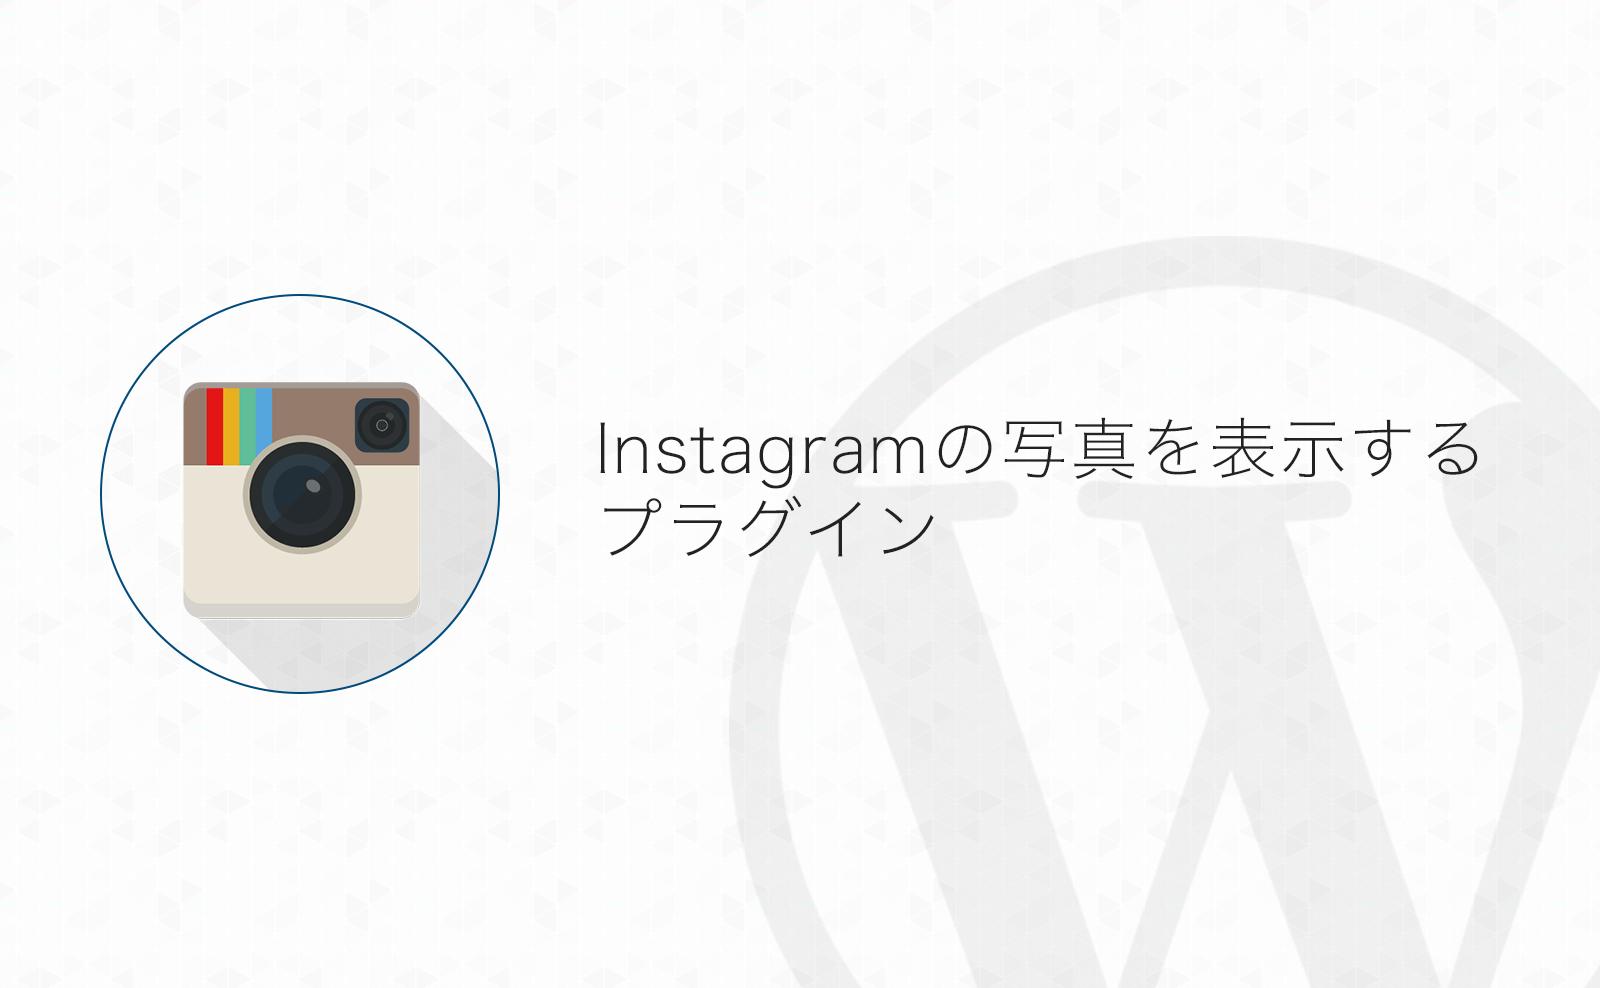 【WordPress】Instagramの投稿を簡単にブログに表示できるプラグイン「Instagram Feed」